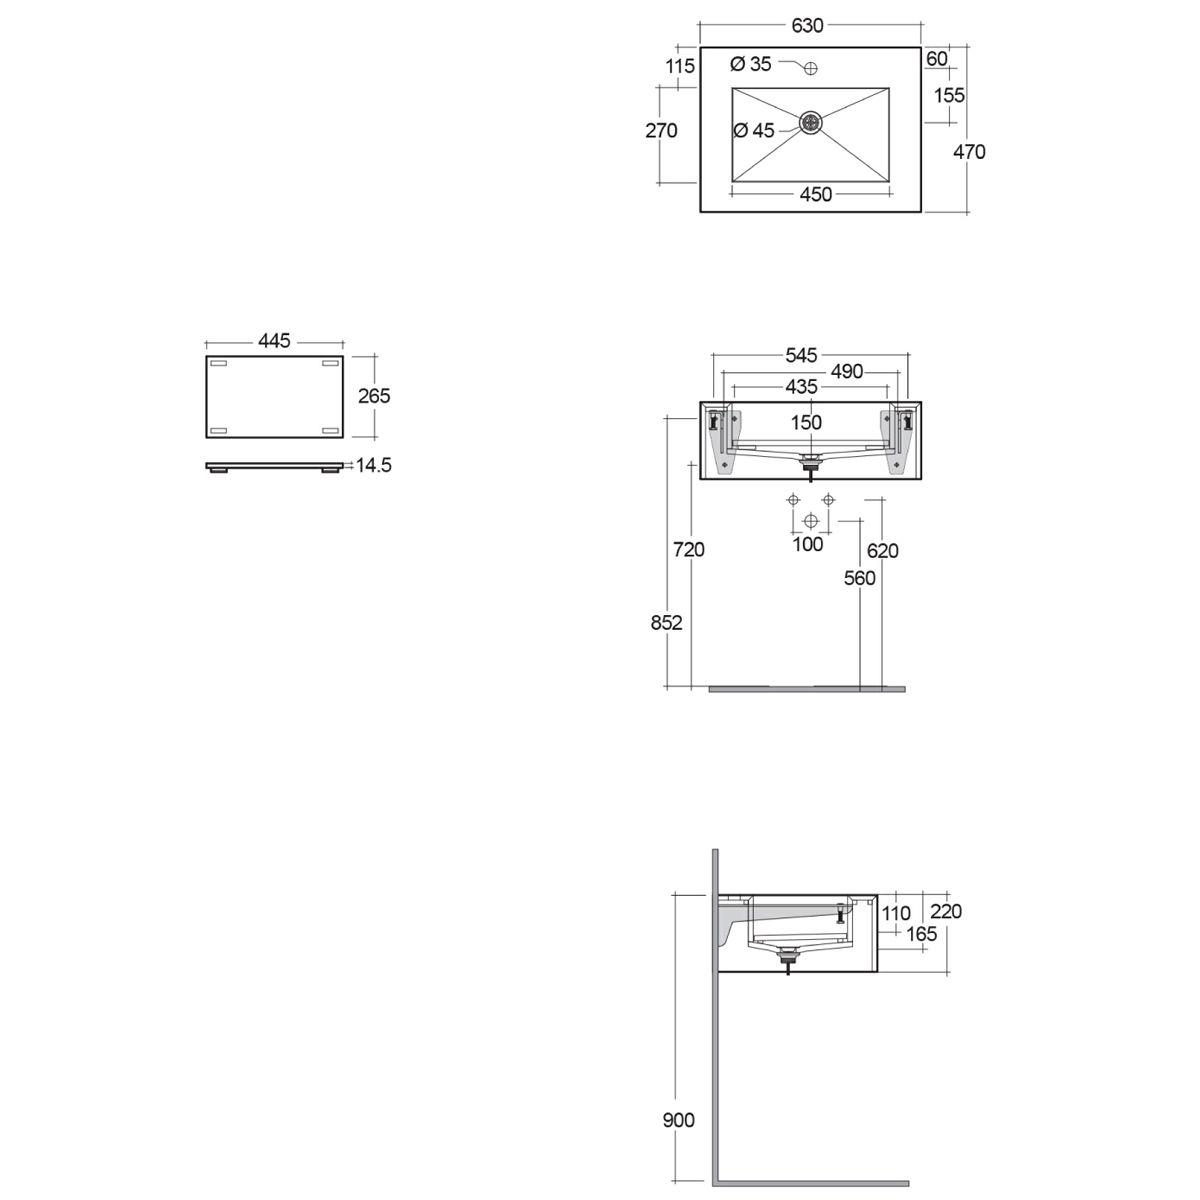 RAK Precious Uni Dark Black Wall Hung Counter Basin with Brackets Measurements